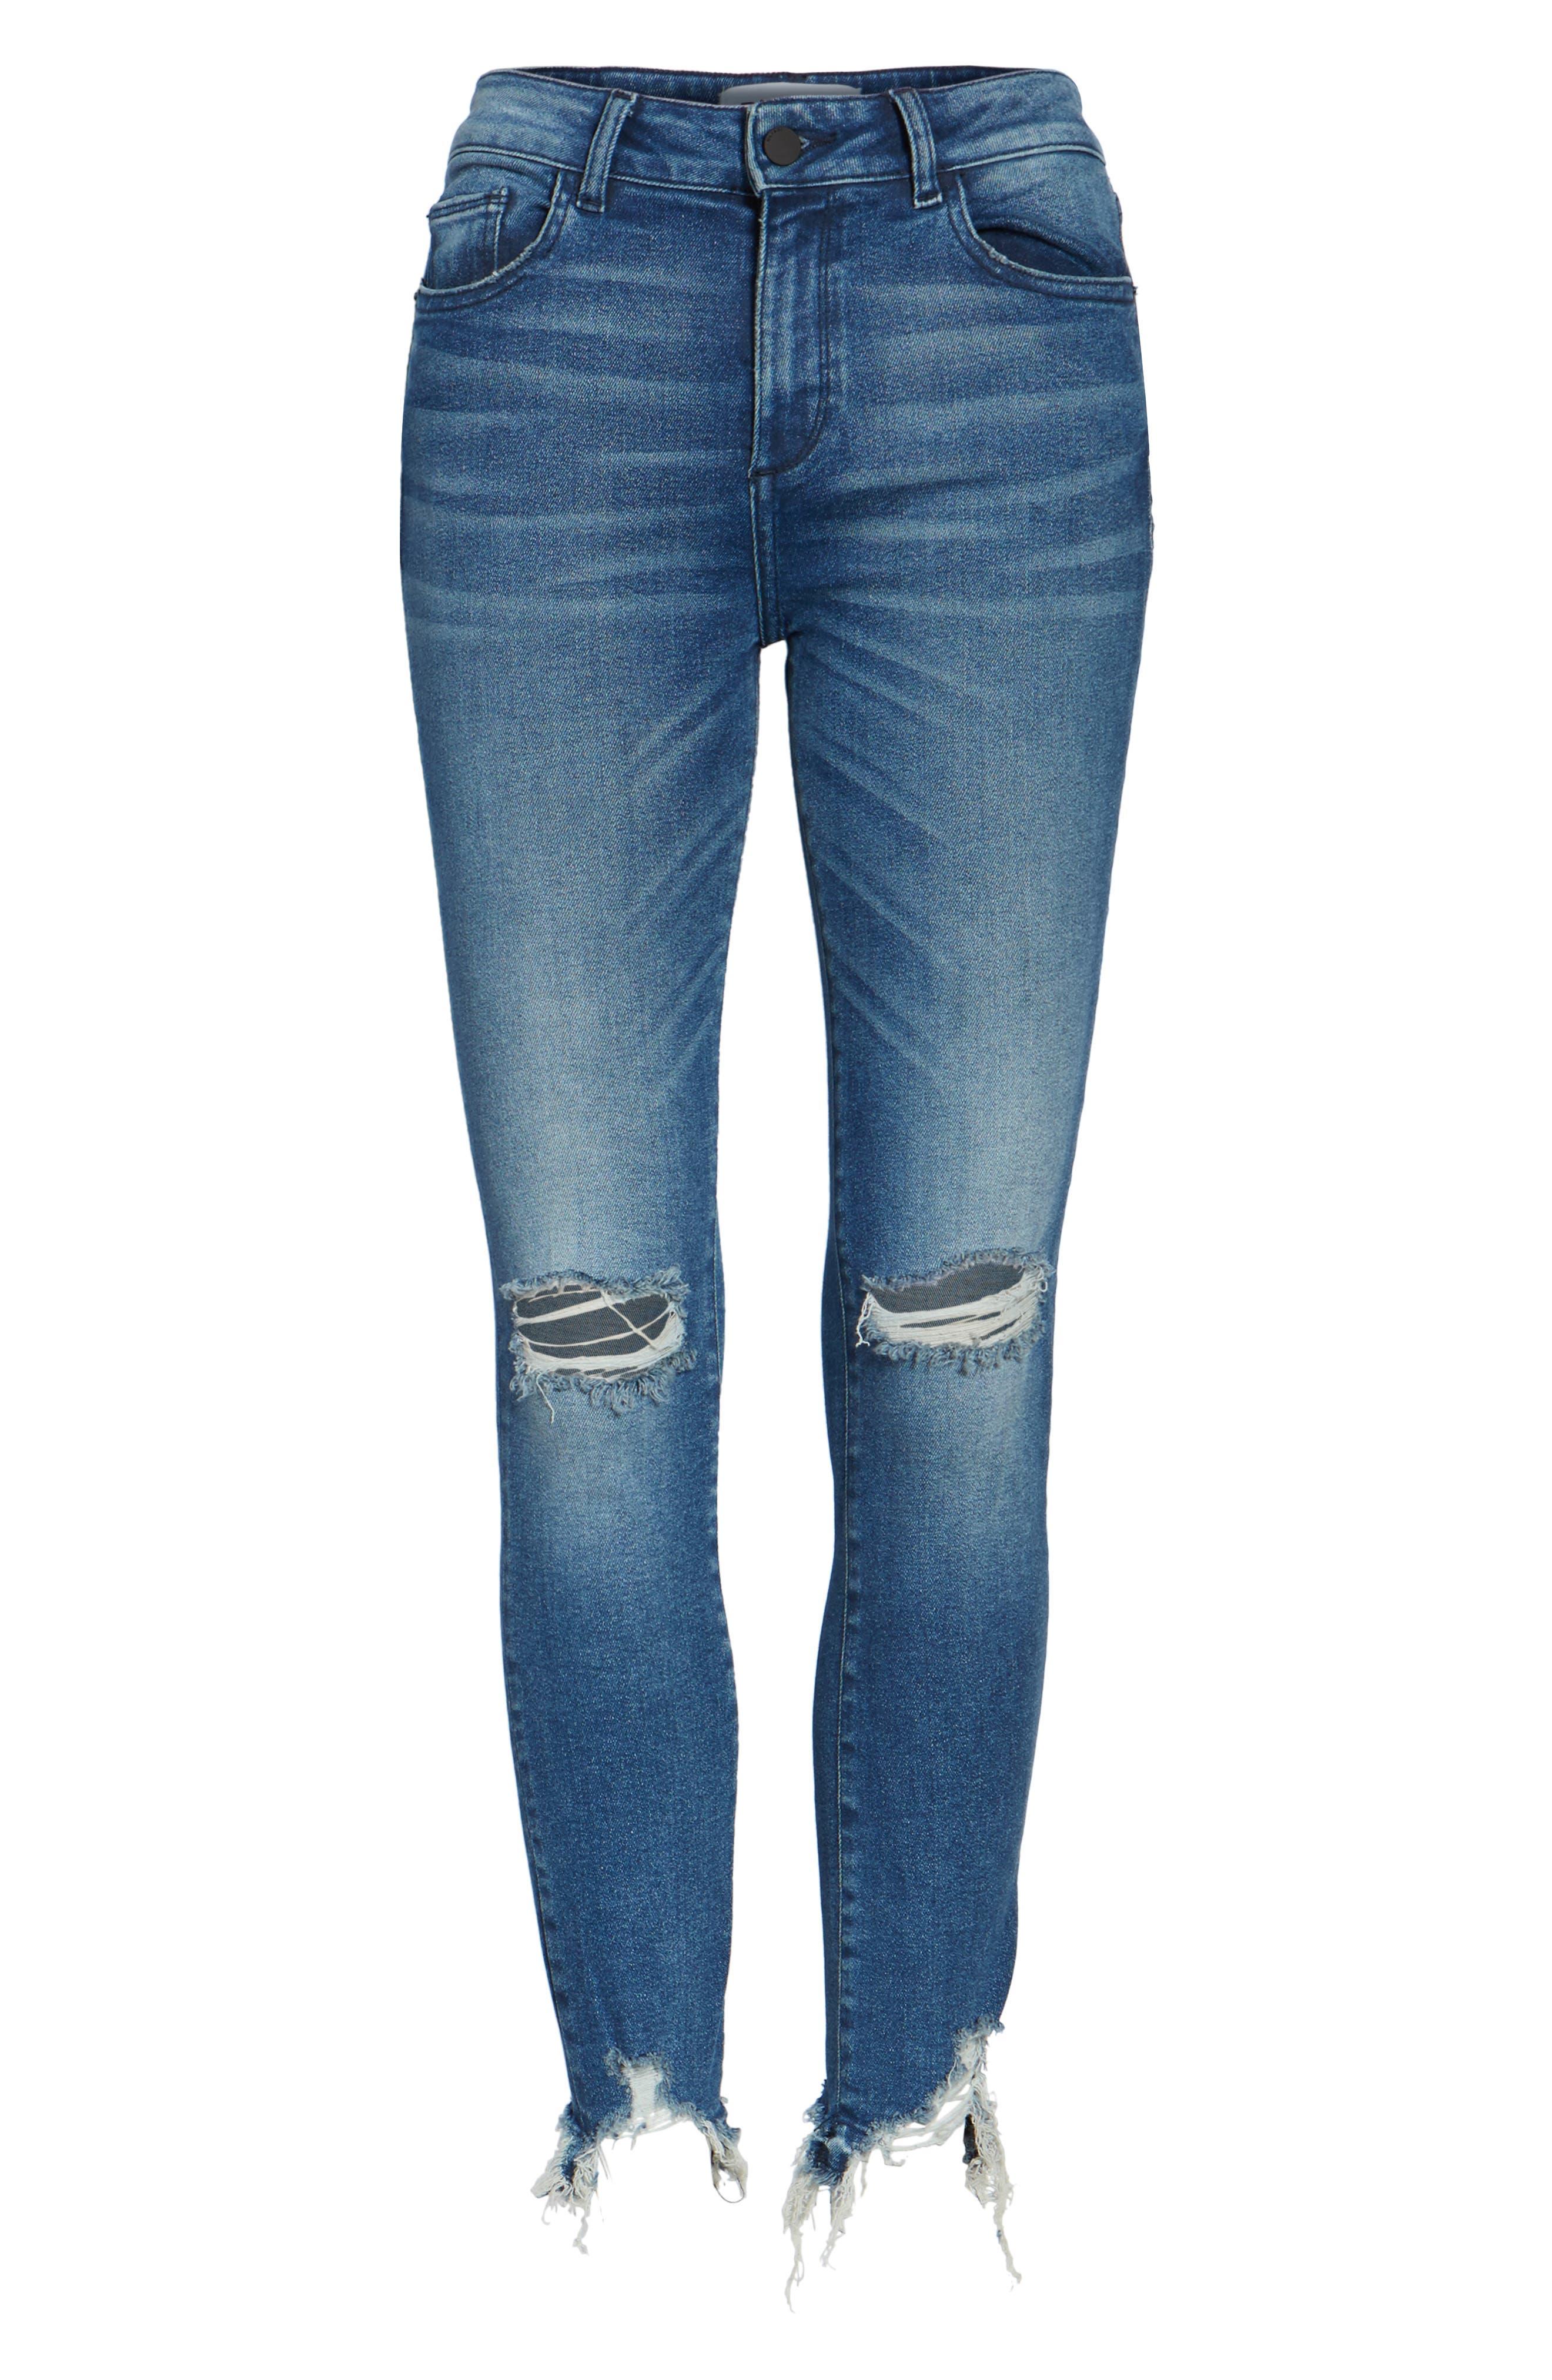 Farrow Instaslim High Waist Ankle Skinny Jeans,                             Alternate thumbnail 7, color,                             430